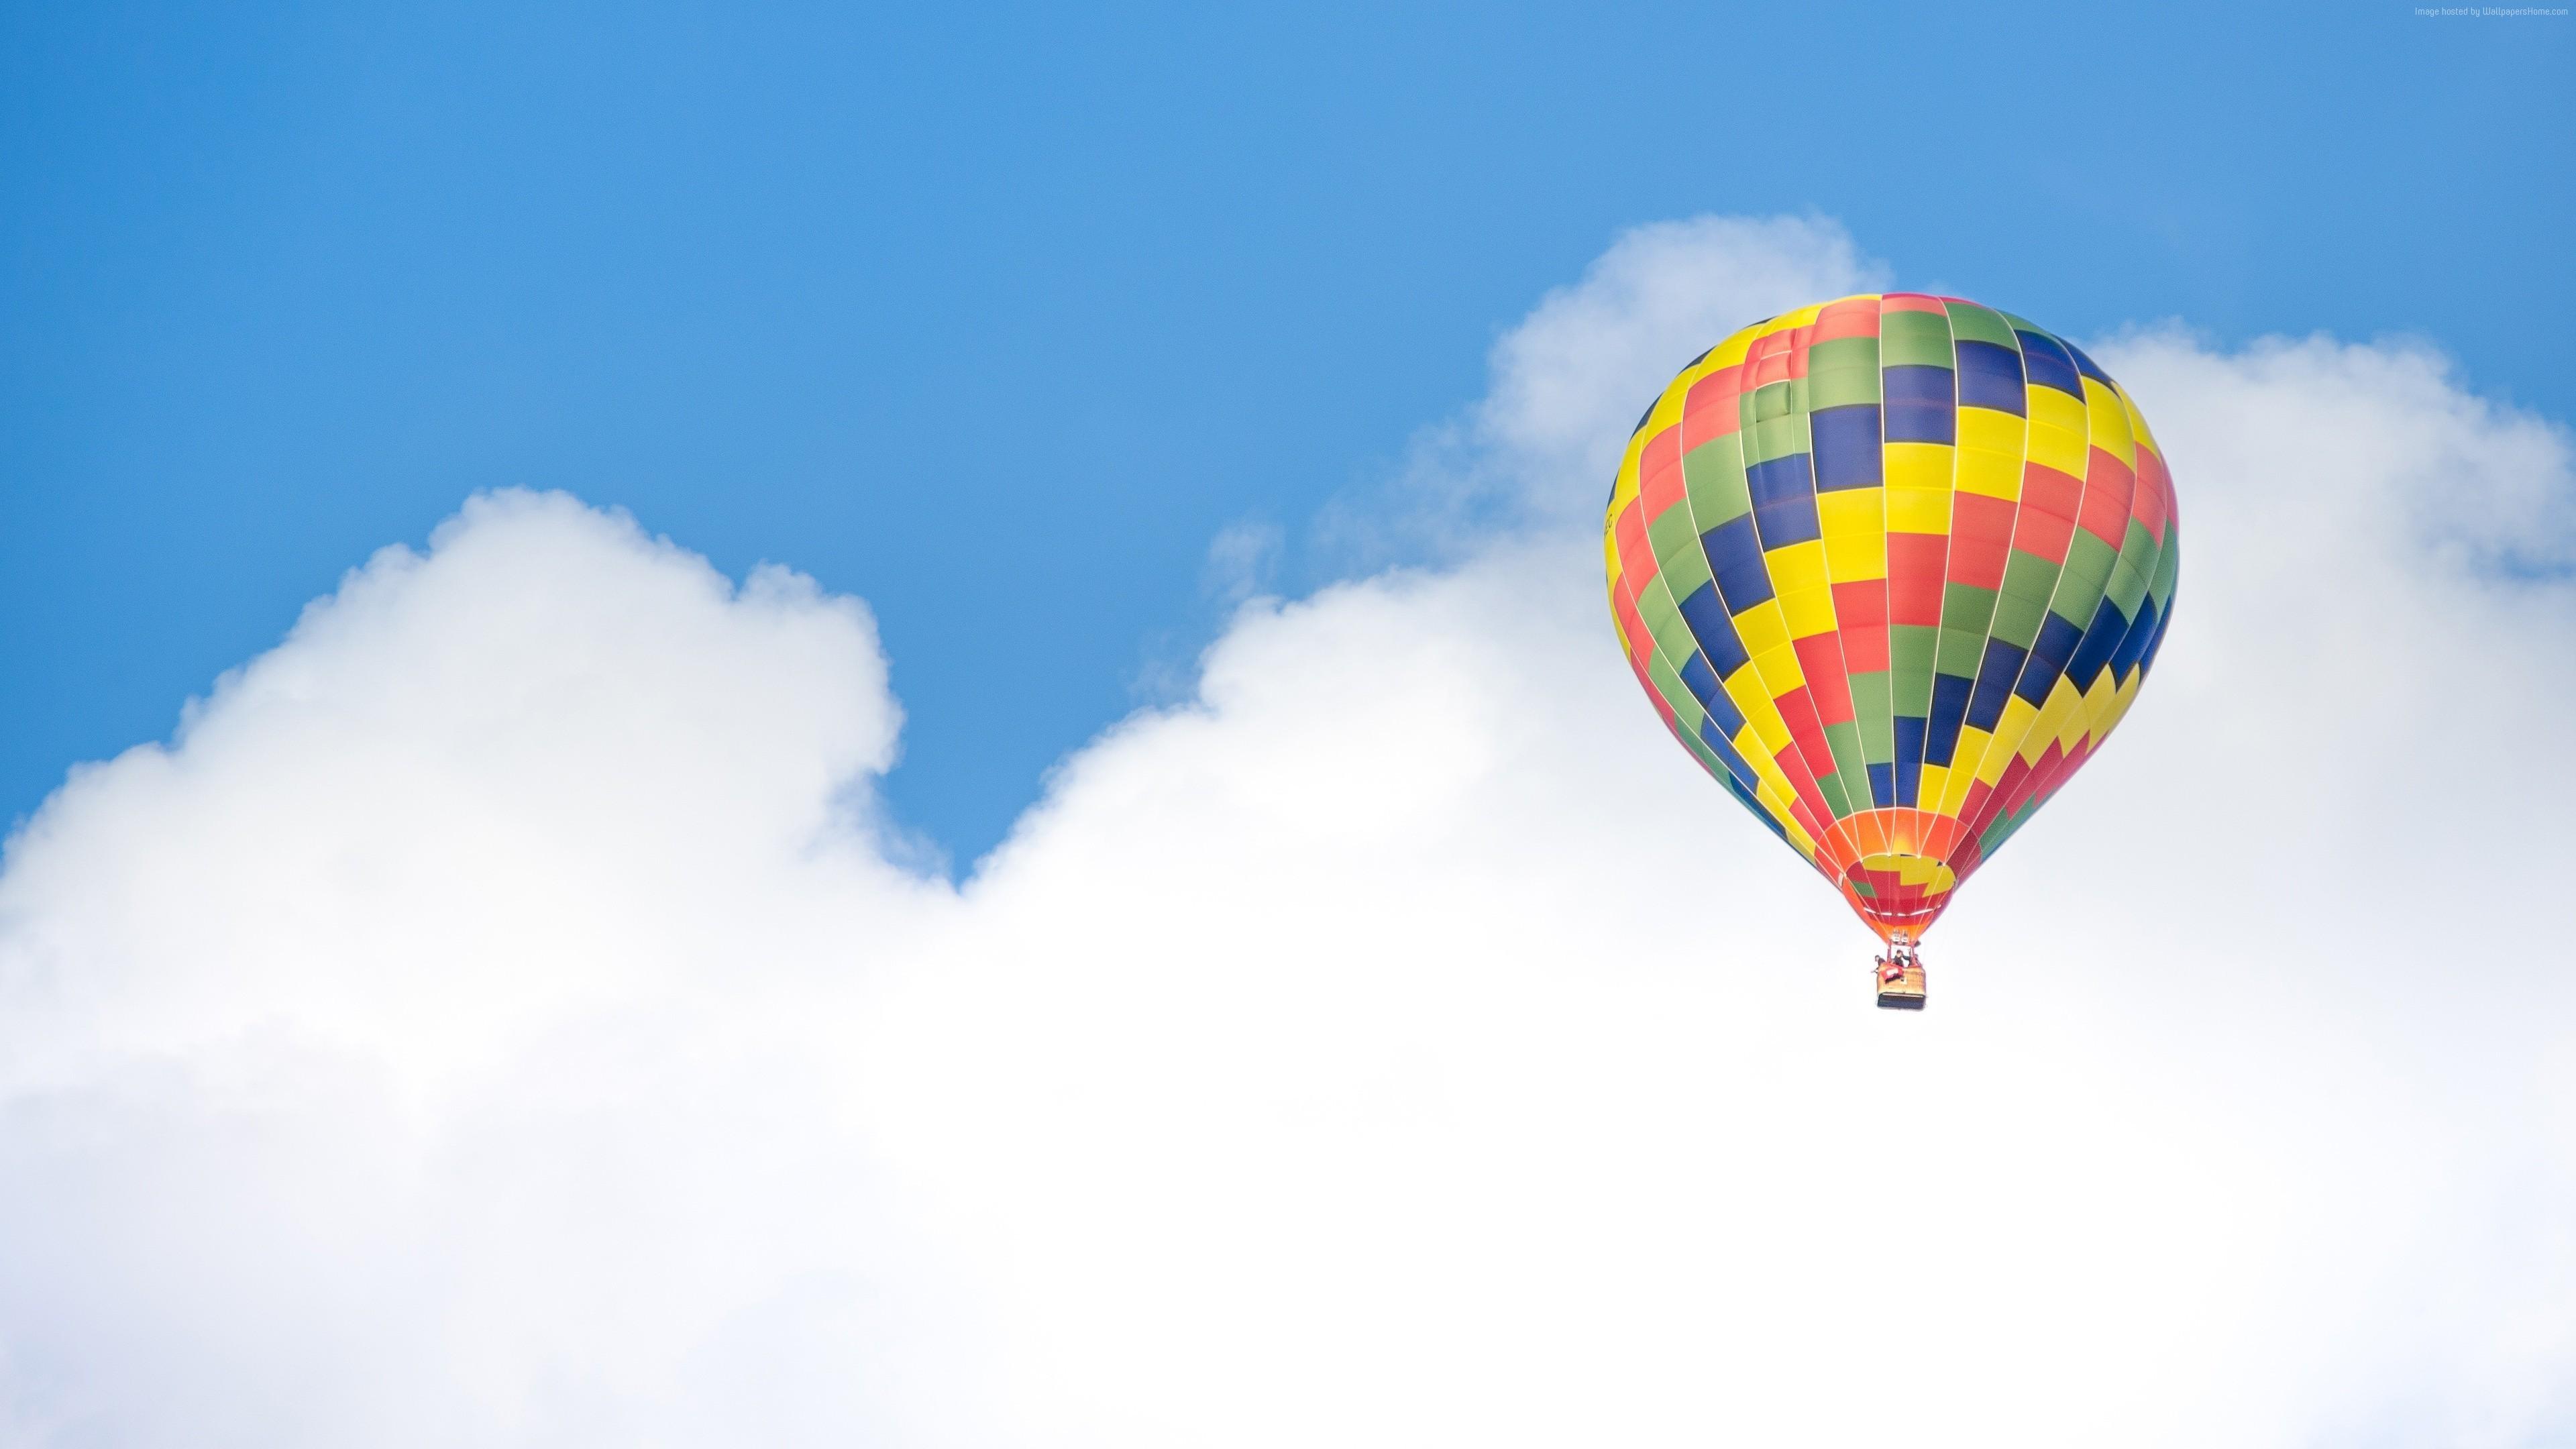 Balloon, 5k, 4k wallpaper, ride, blue, sky, clouds (horizontal …